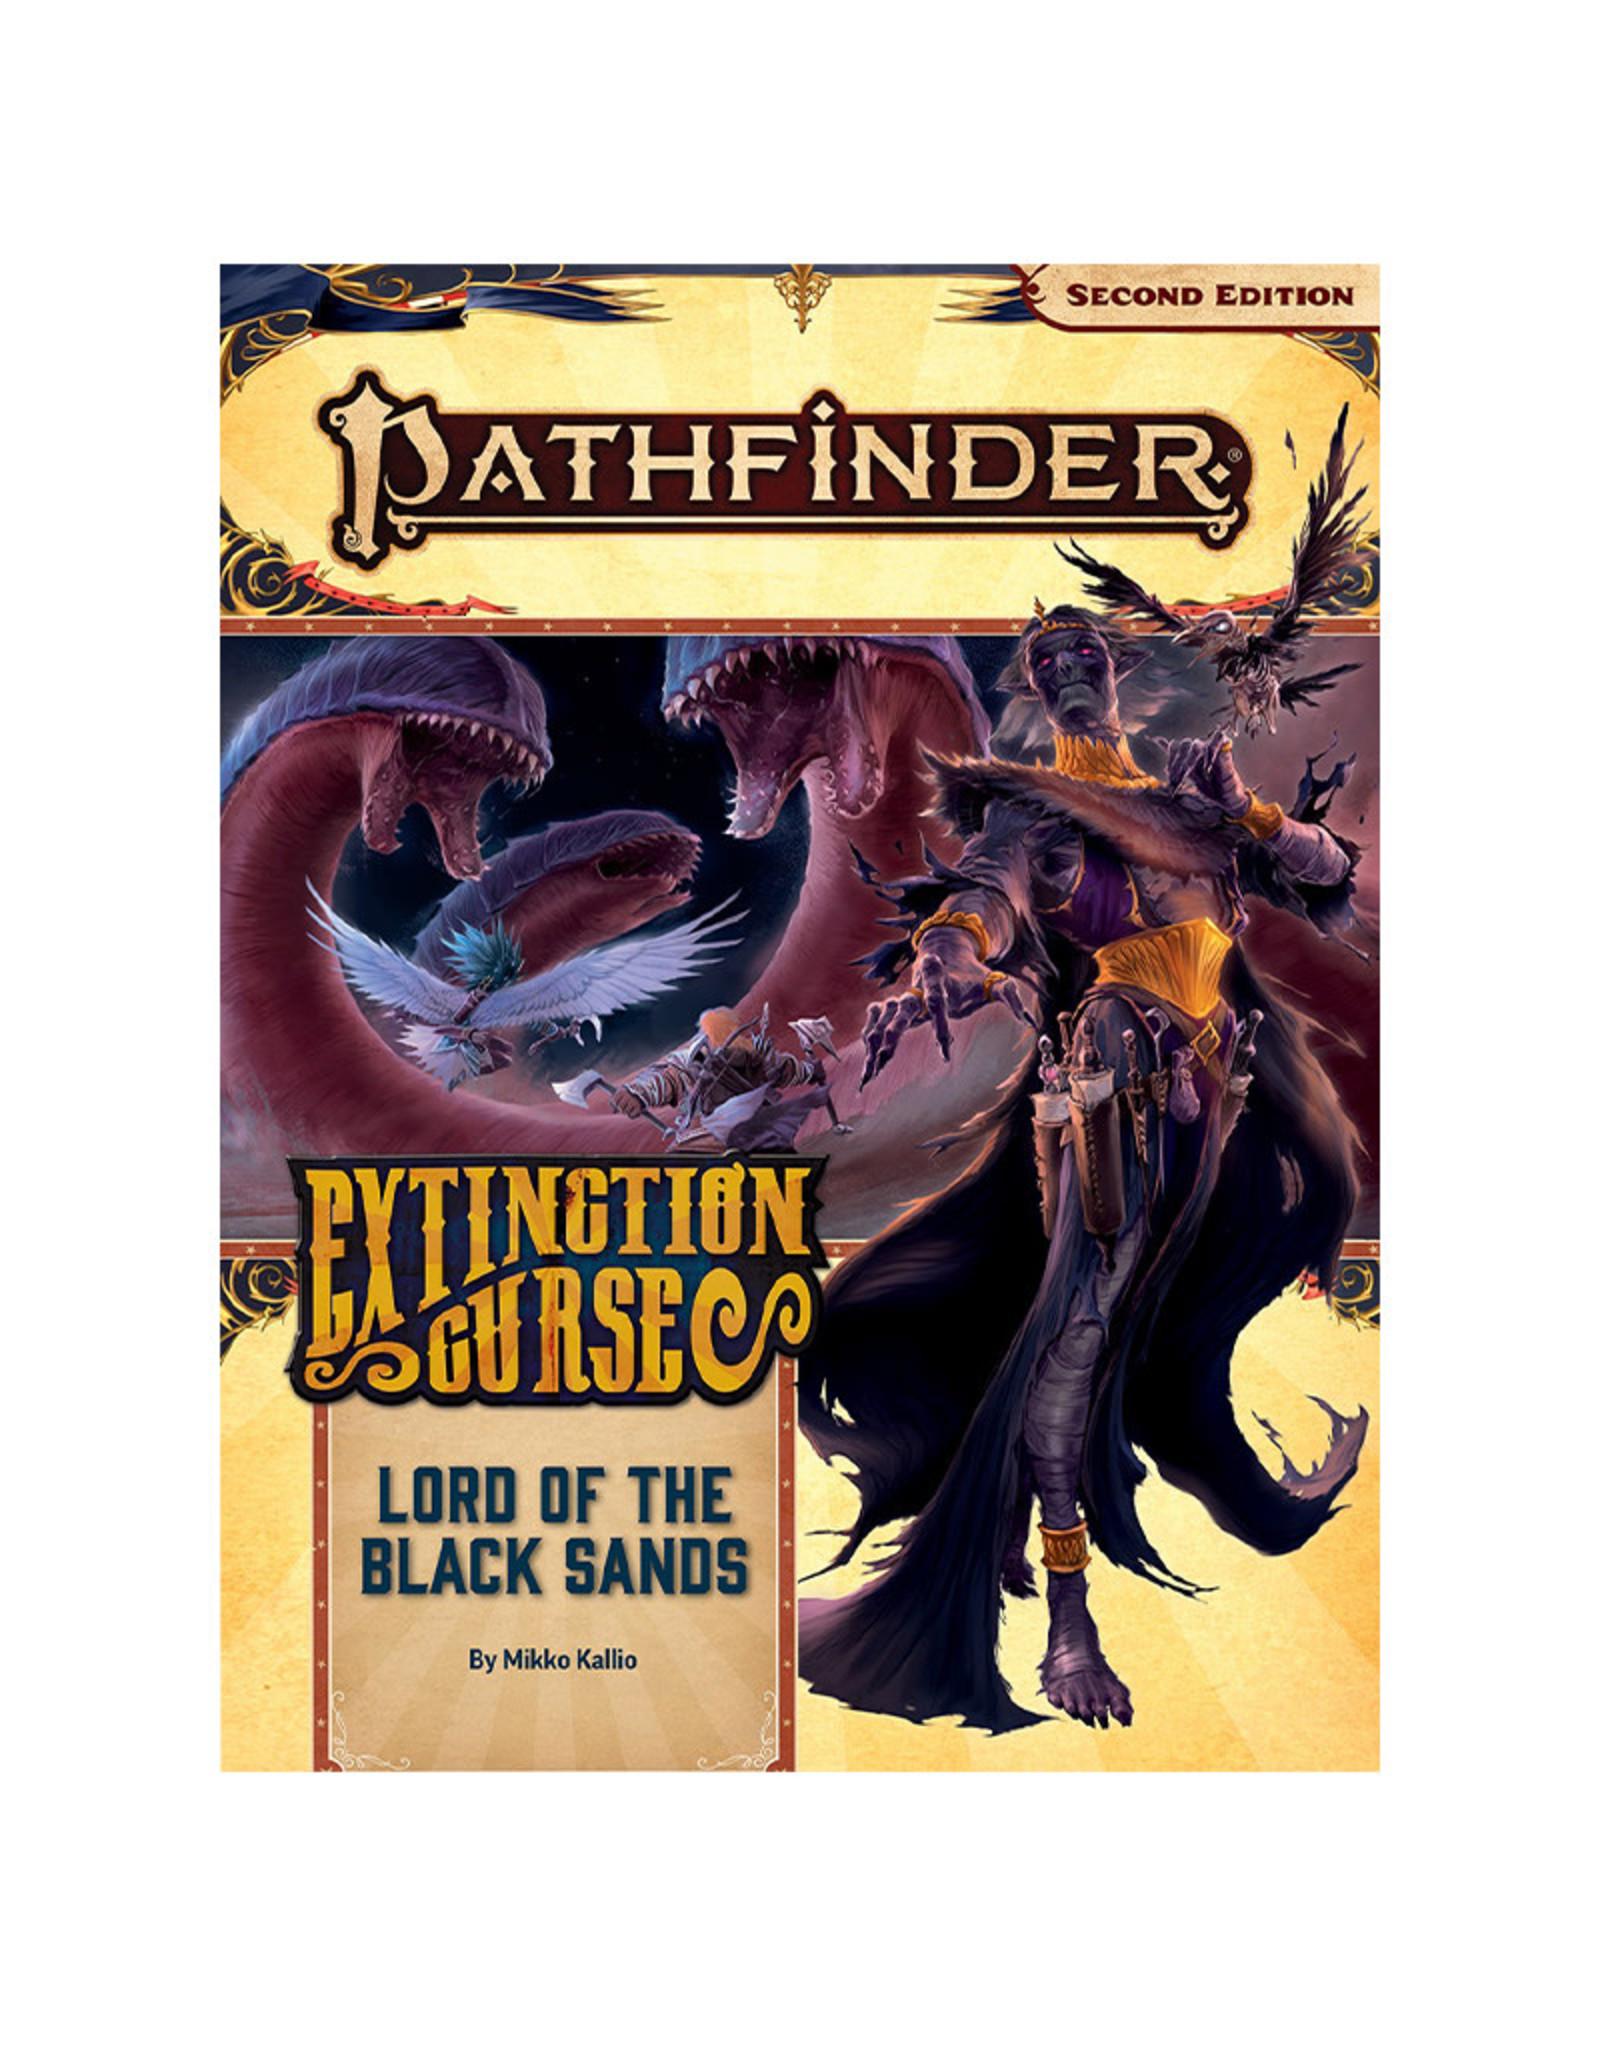 Paizo Pathfinder RPG: Adventure Path - Extinction Curse Part 5 - Lord of the Black Sands (P2)